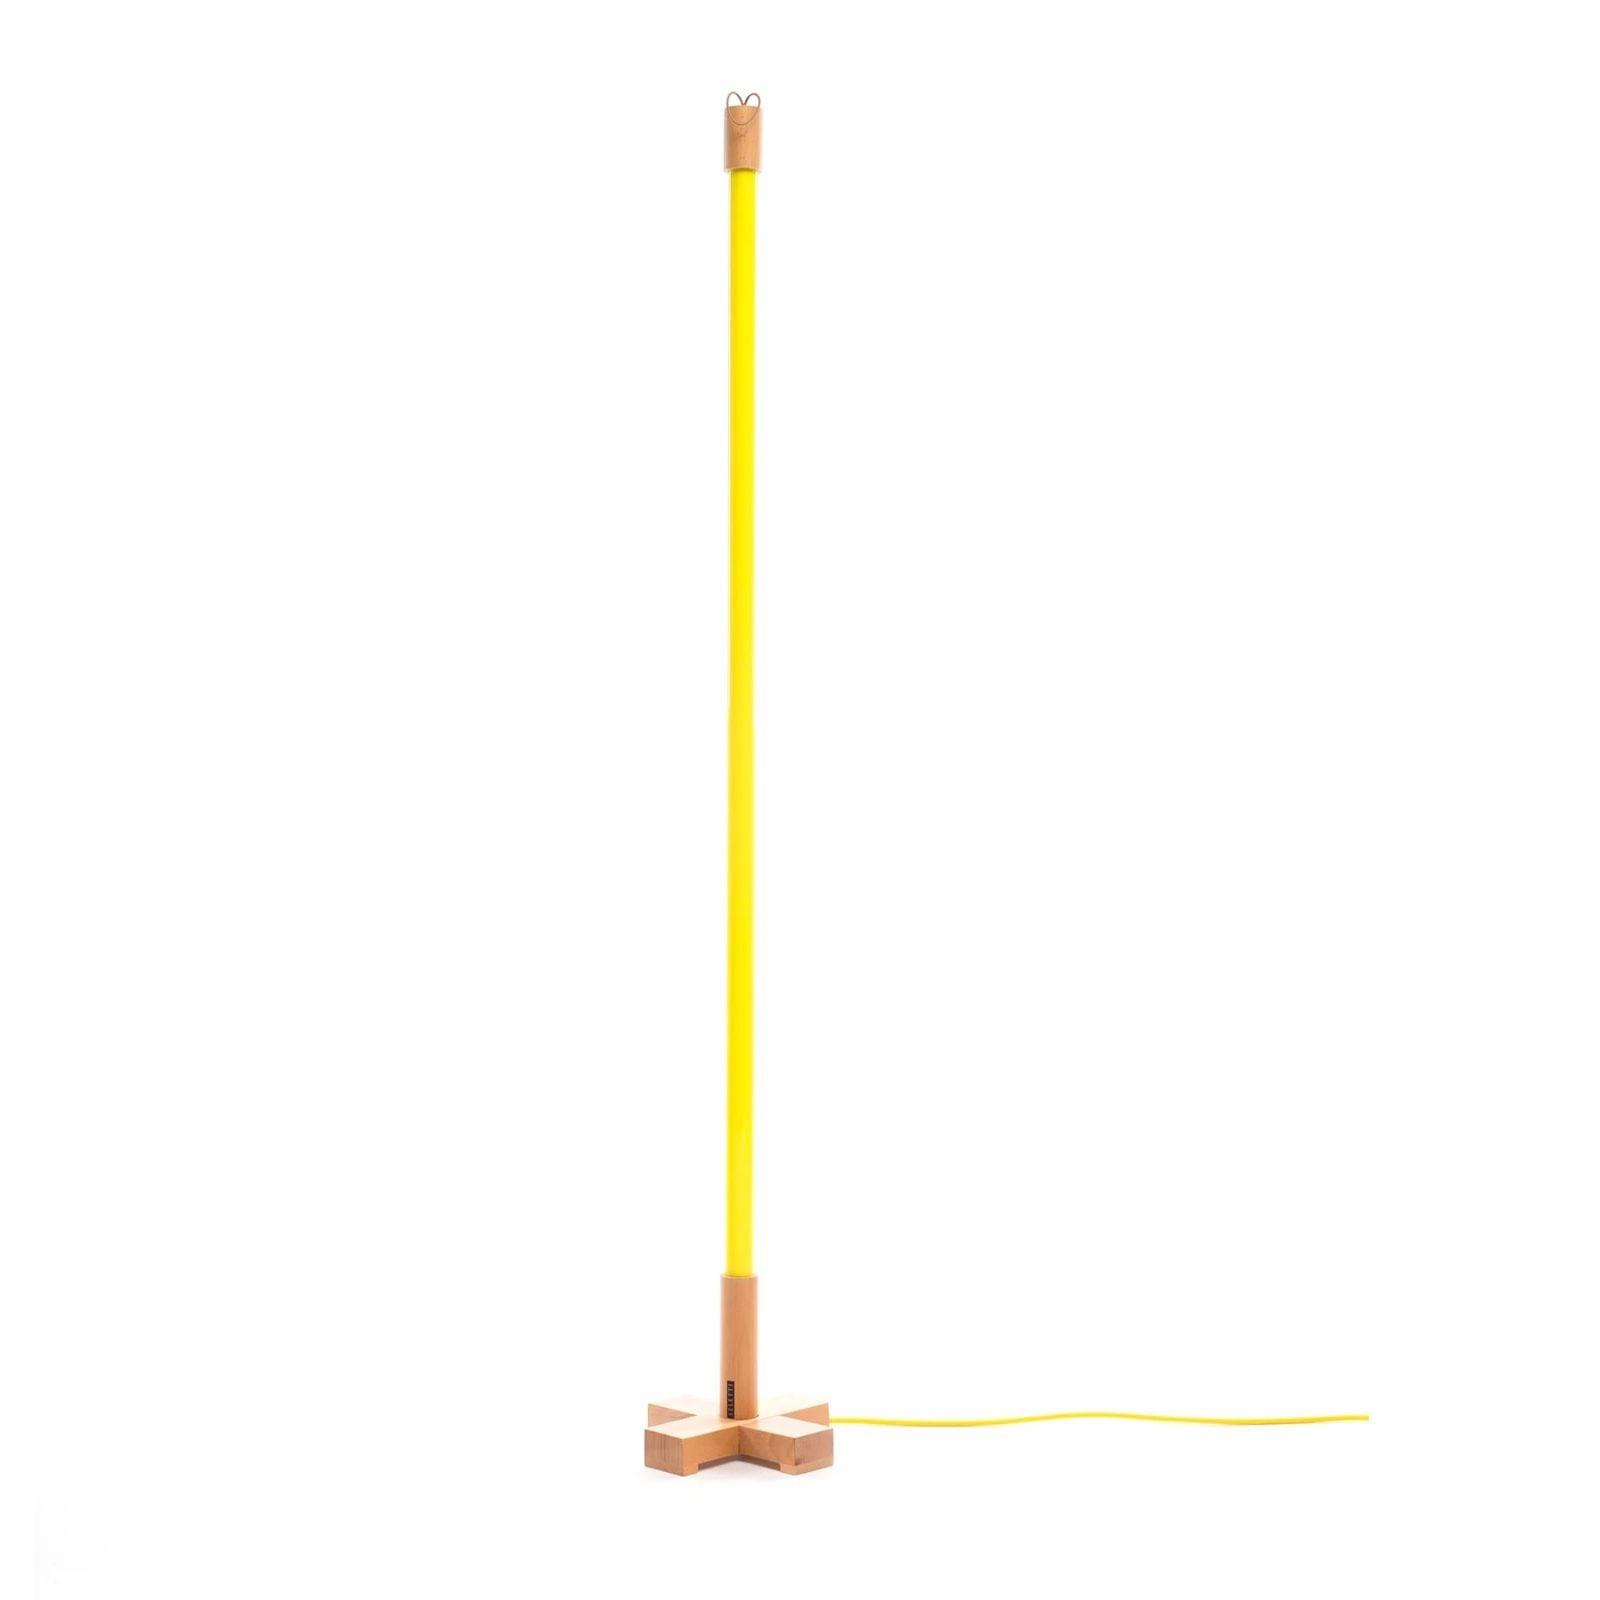 Linea Led Lamp (Yellow) - Seletti